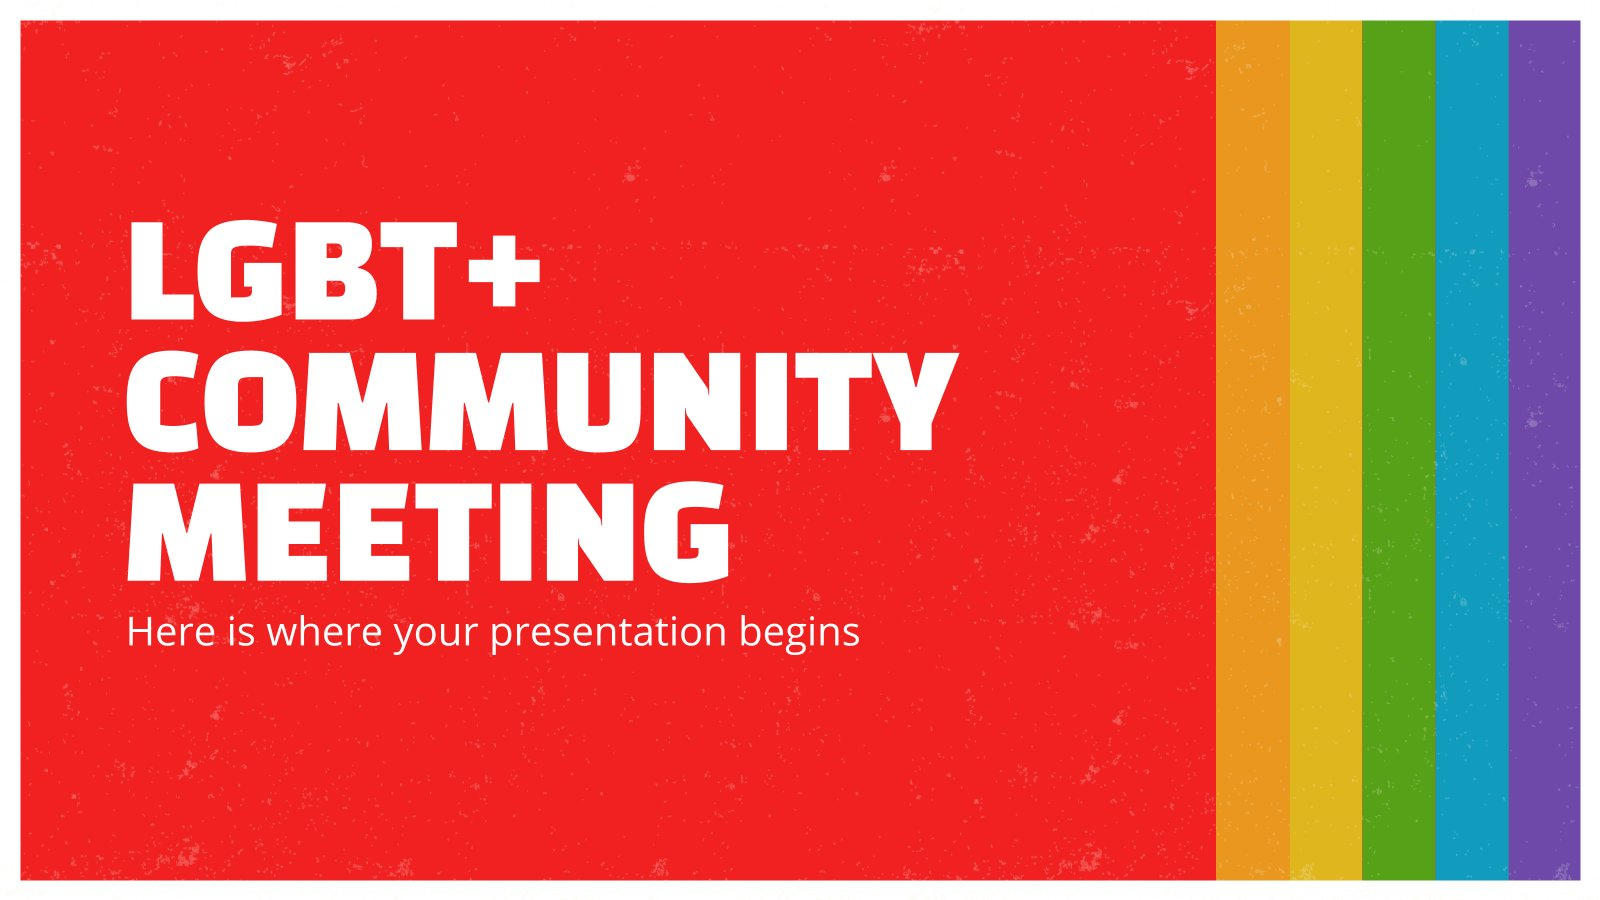 LGBT+ Community Meeting presentation template